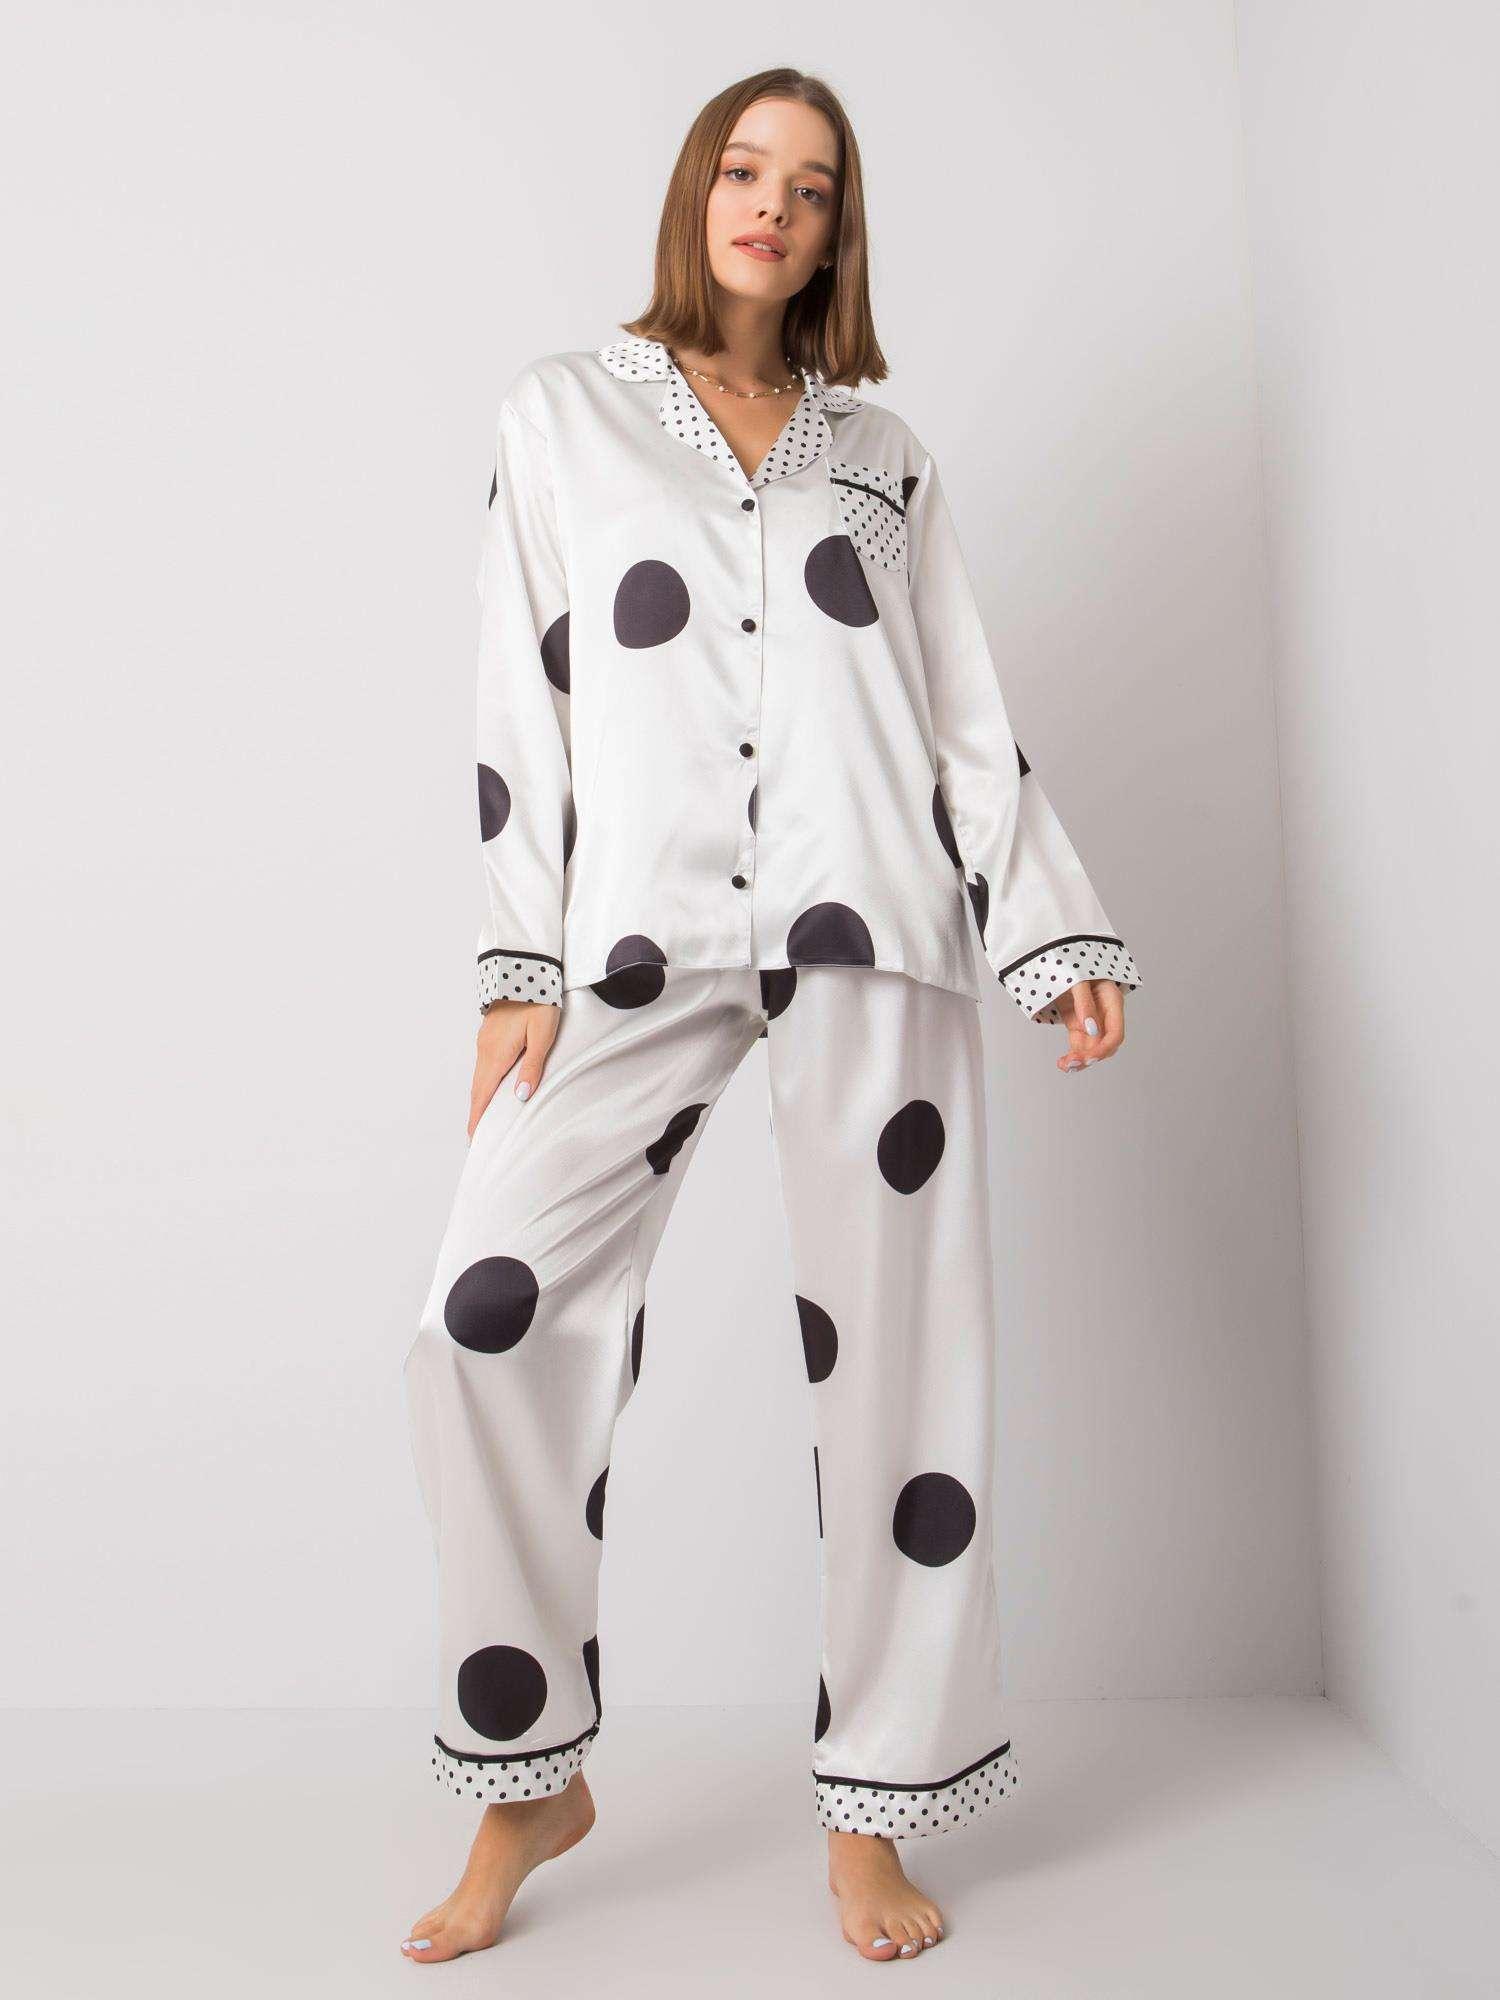 Dámské bílé pyžamo s kalhotami